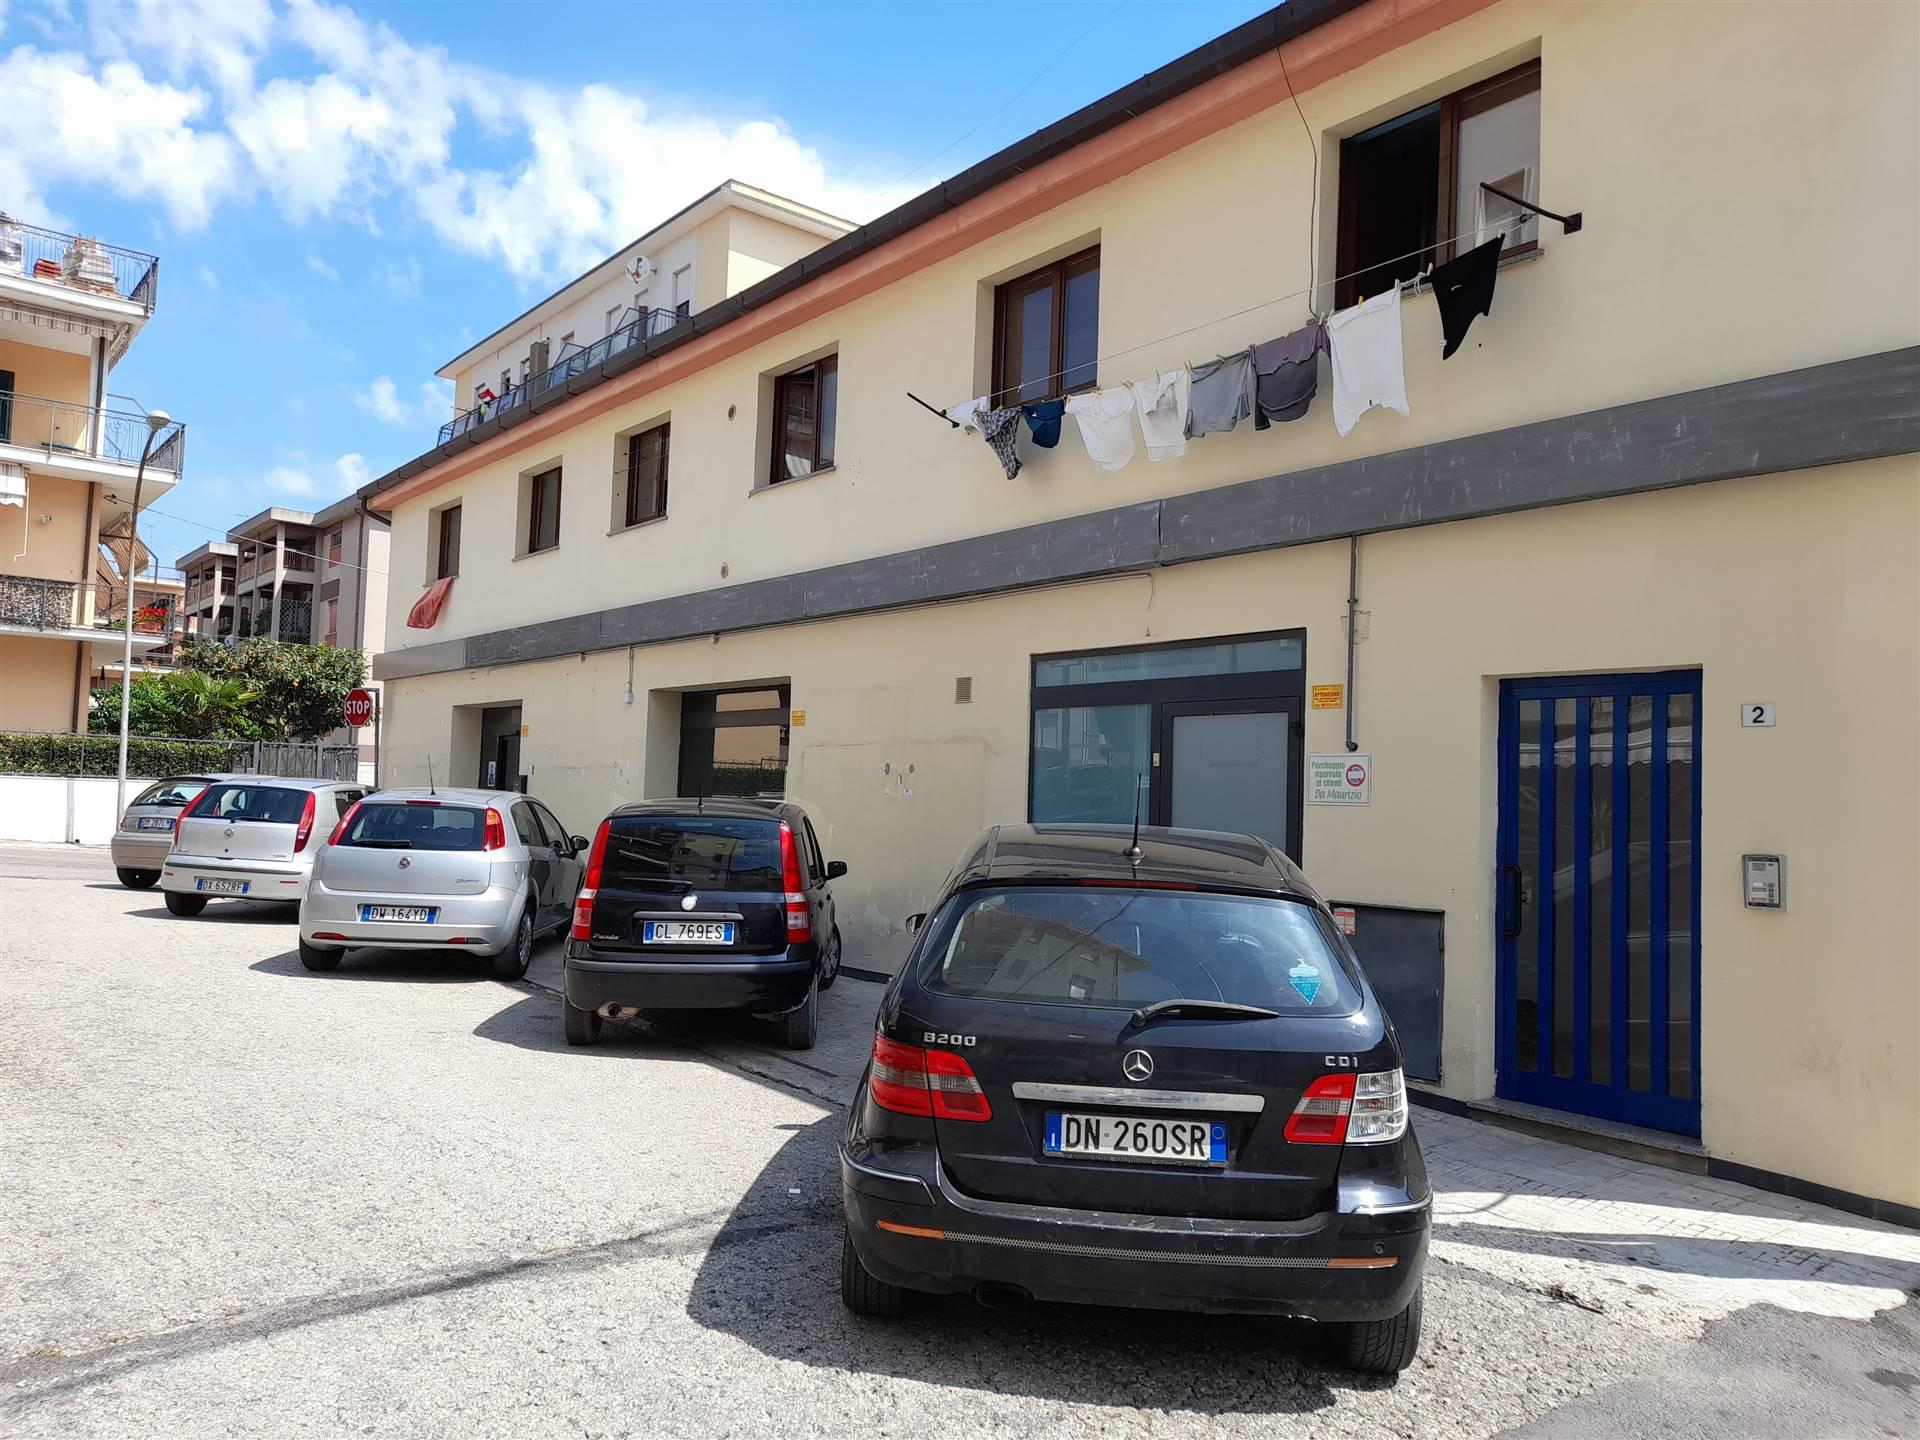 Foto parcheggio esterno